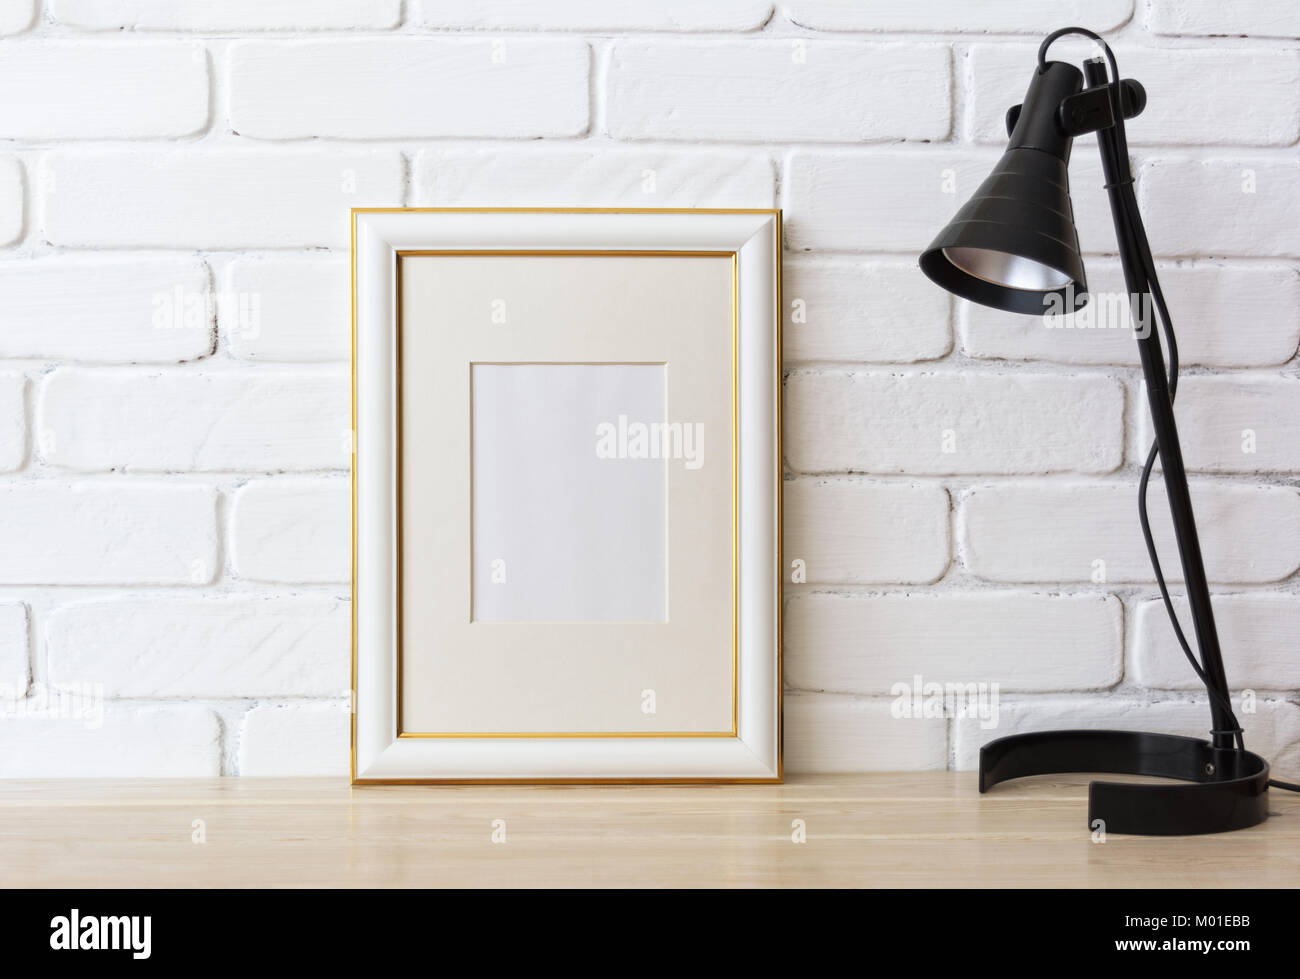 Atemberaubend Framing Eine Badezimmerwand Galerie ...